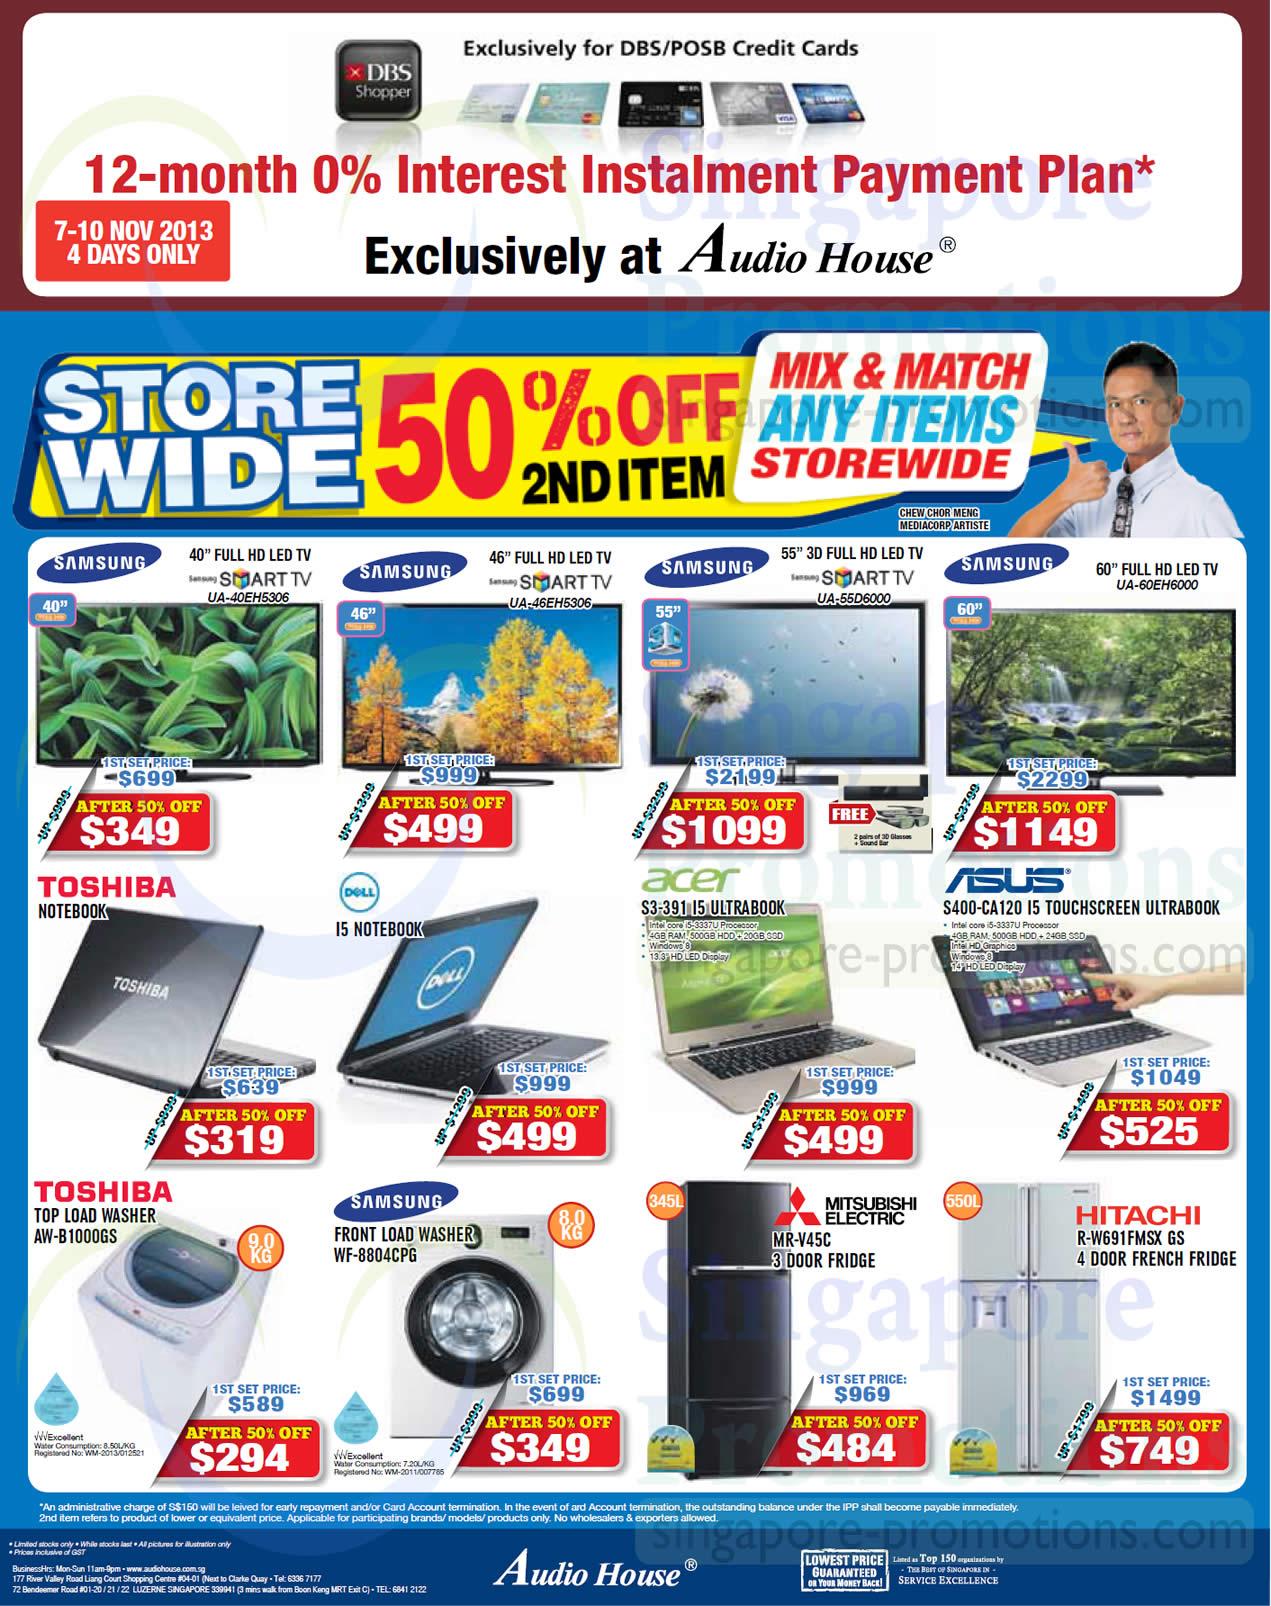 Samsung UA40EH5306 TV, Samsung UA46EH5306 TV, Samsung UA55D6000 TV, Samsung UA60EH6000 TV, Acer S3-391 Notebook, ASUS S400-CA120 Notebook, Toshiba AW-B1000GS Washer, Samsung WF-8804CPG Washer, Mitsubishi Electric MR-V45C Fridge and Hitachi R-W691FMSX GS Fridge